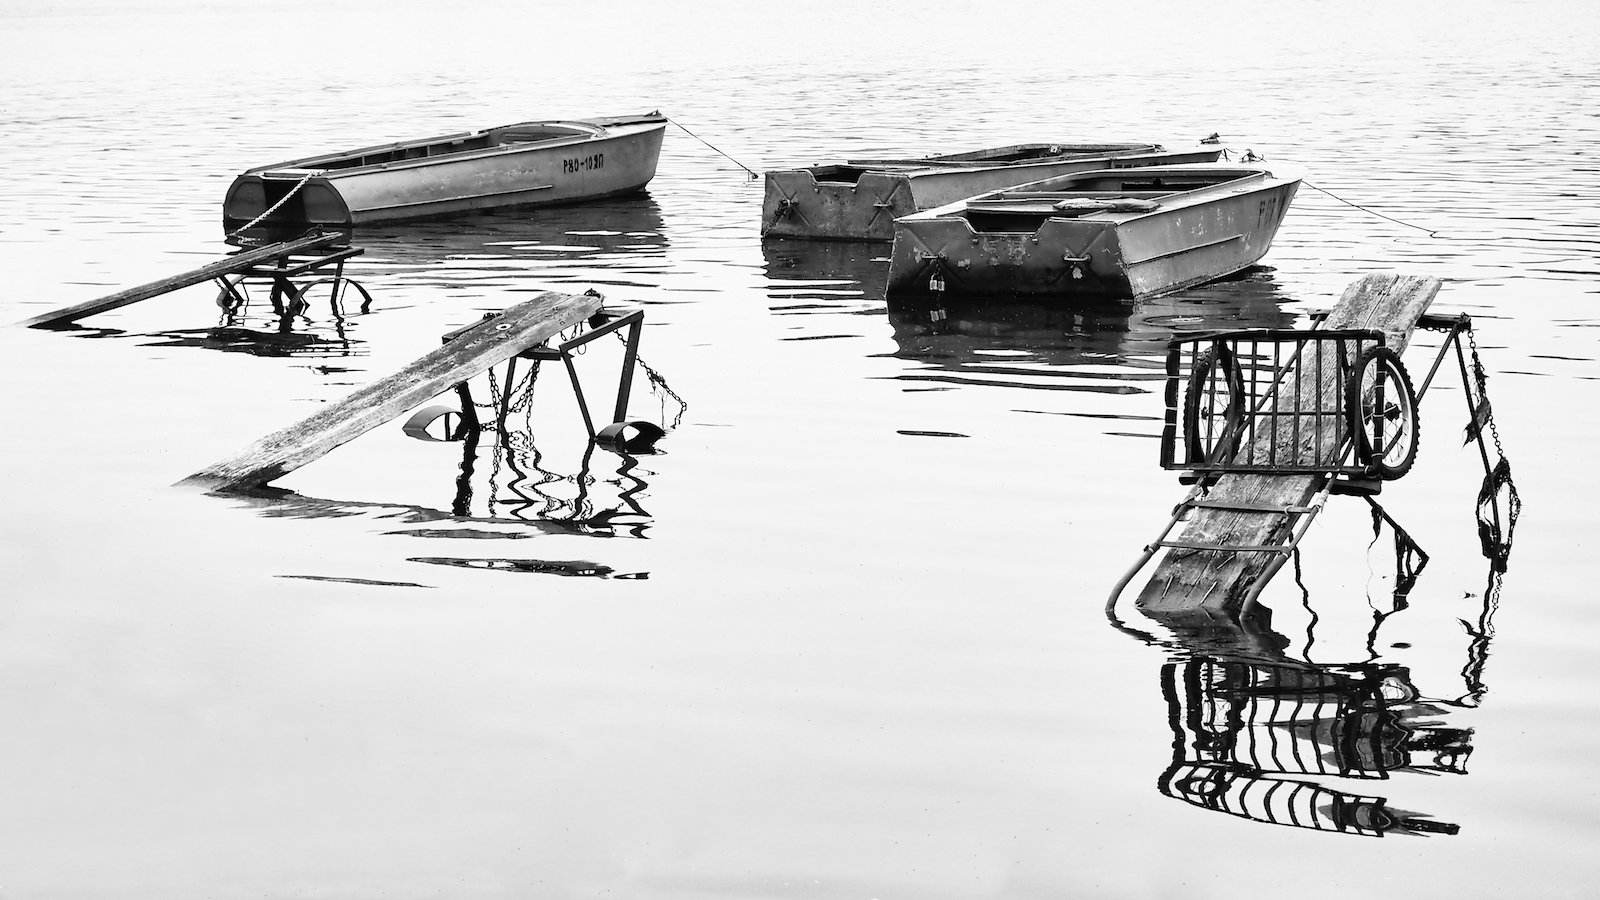 Графика, Лодки, Монохром, Причалы, Река волга, СПИРИДОНОВ НИКОЛАЙ